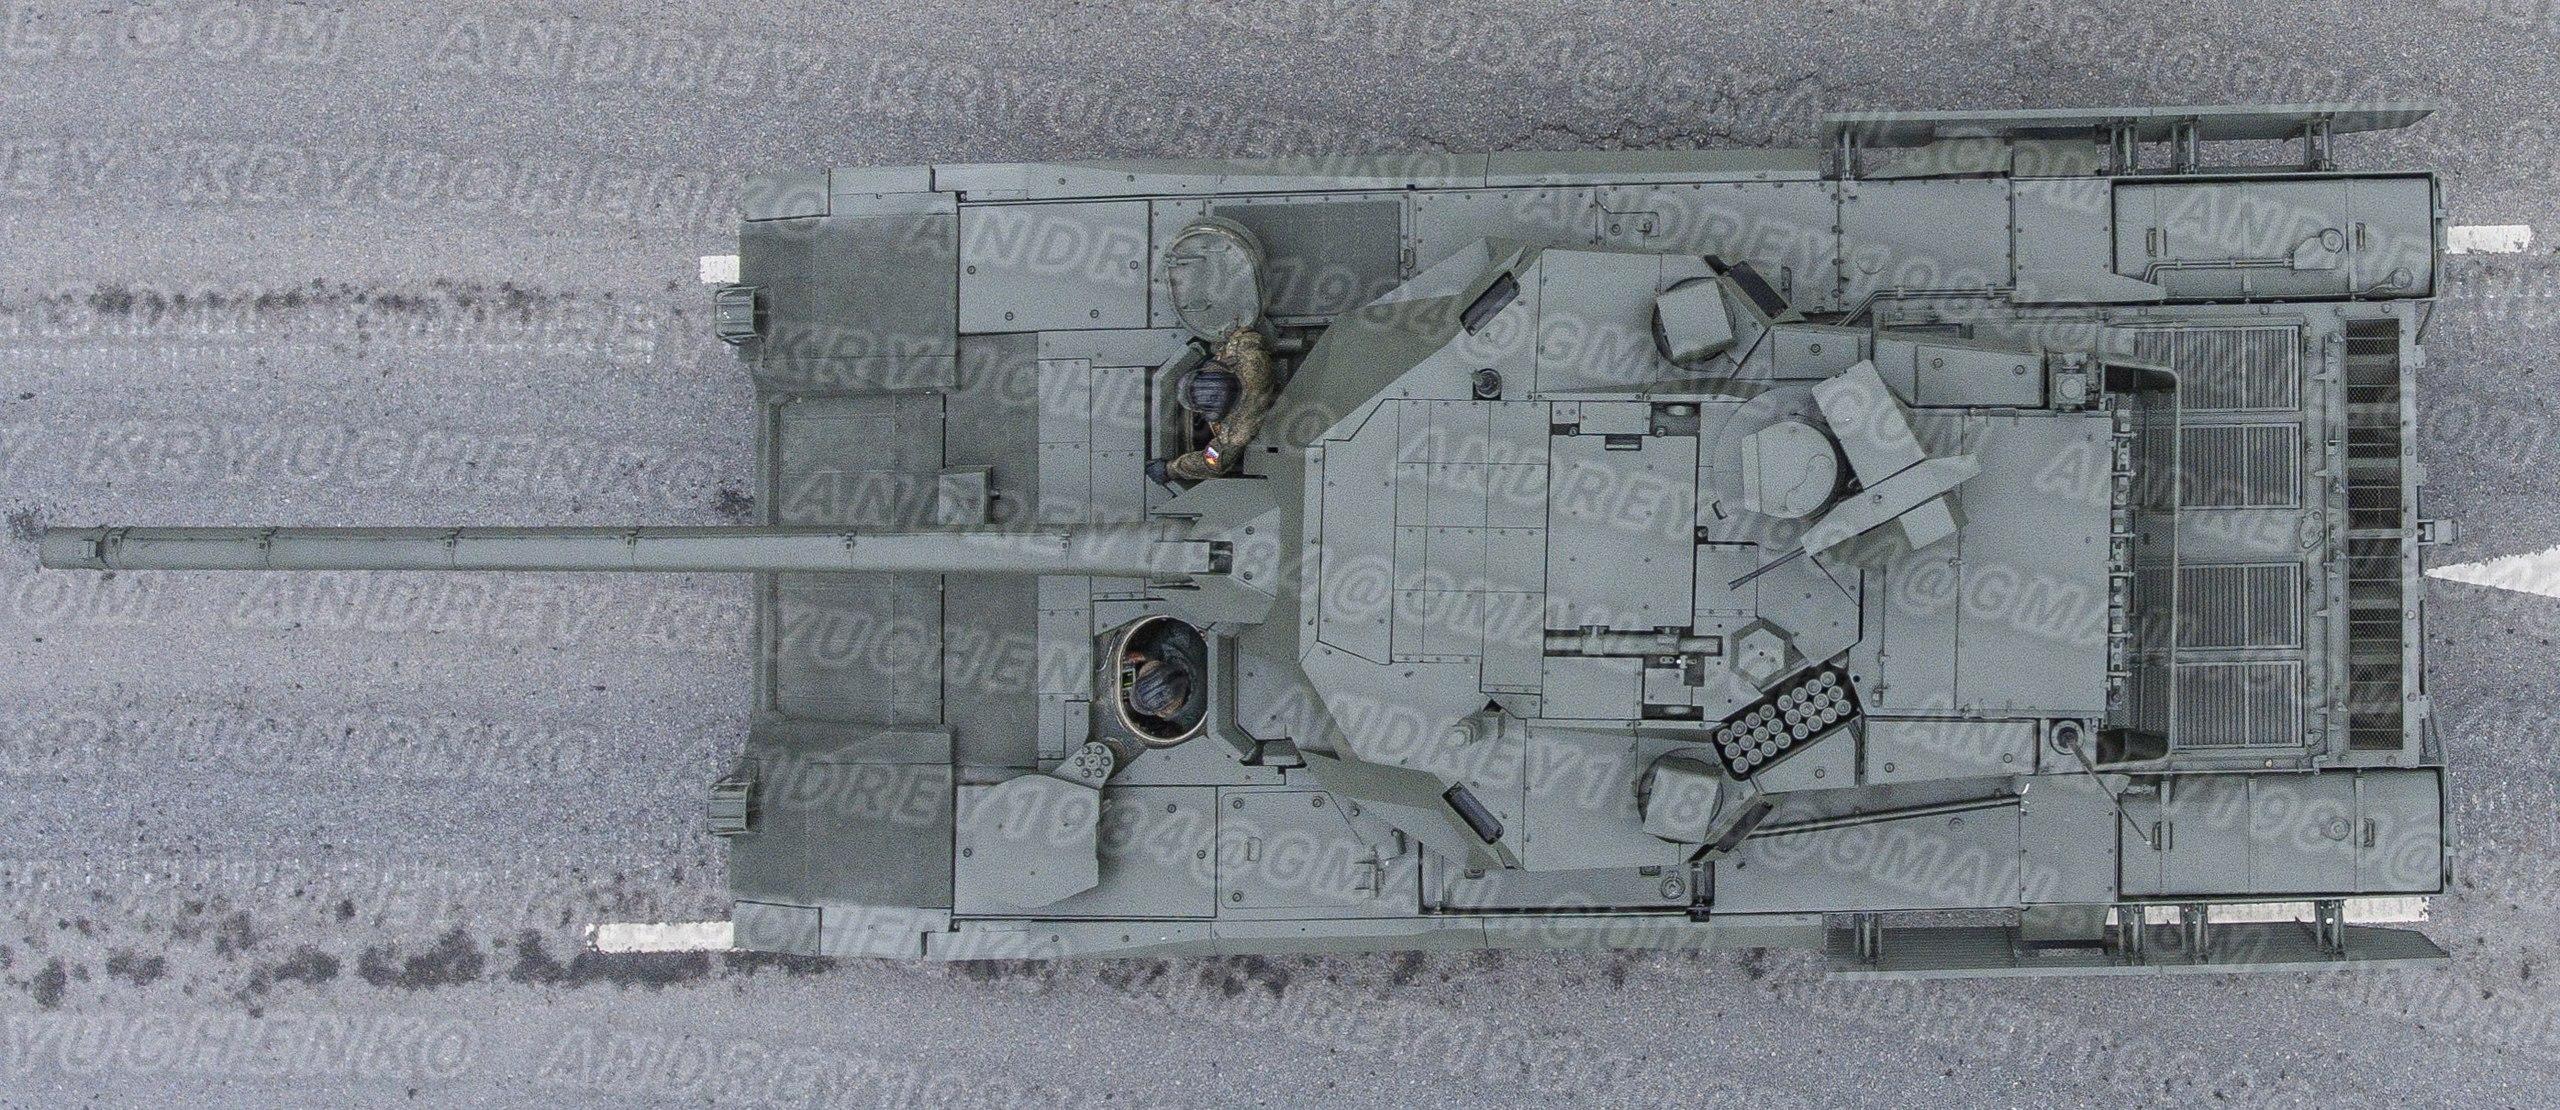 T-14 Armata, top view.